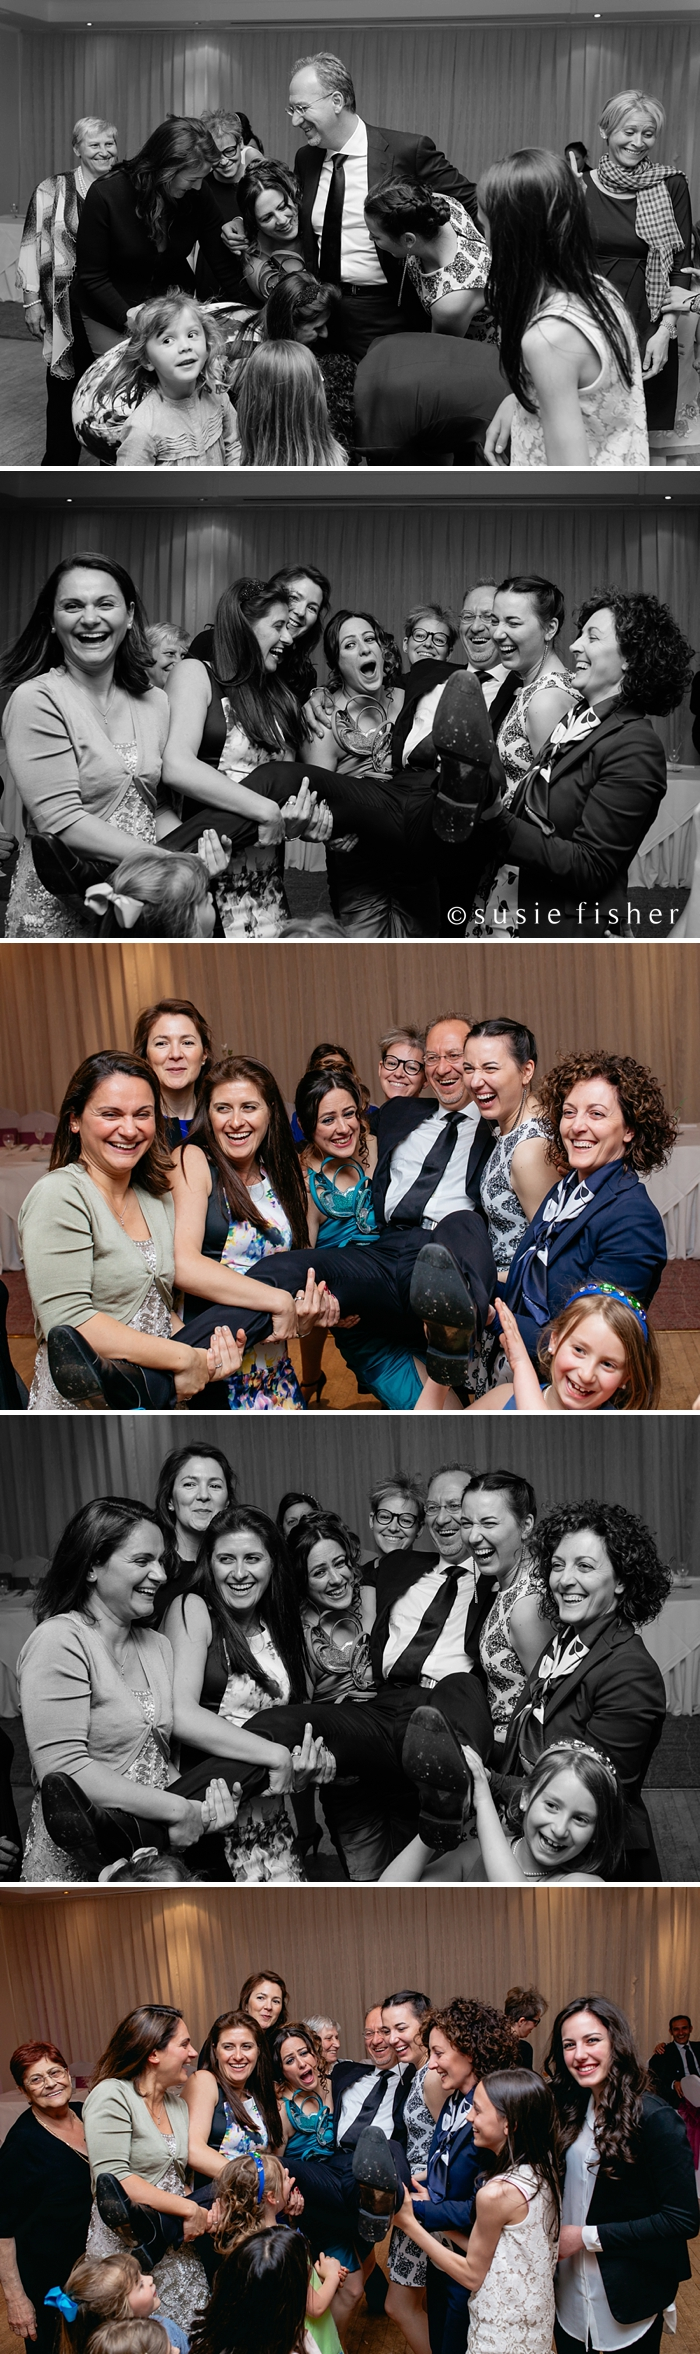 Surrey Wedding Photographer at Oatlands Park_Copyright Susie Fisher.jpg